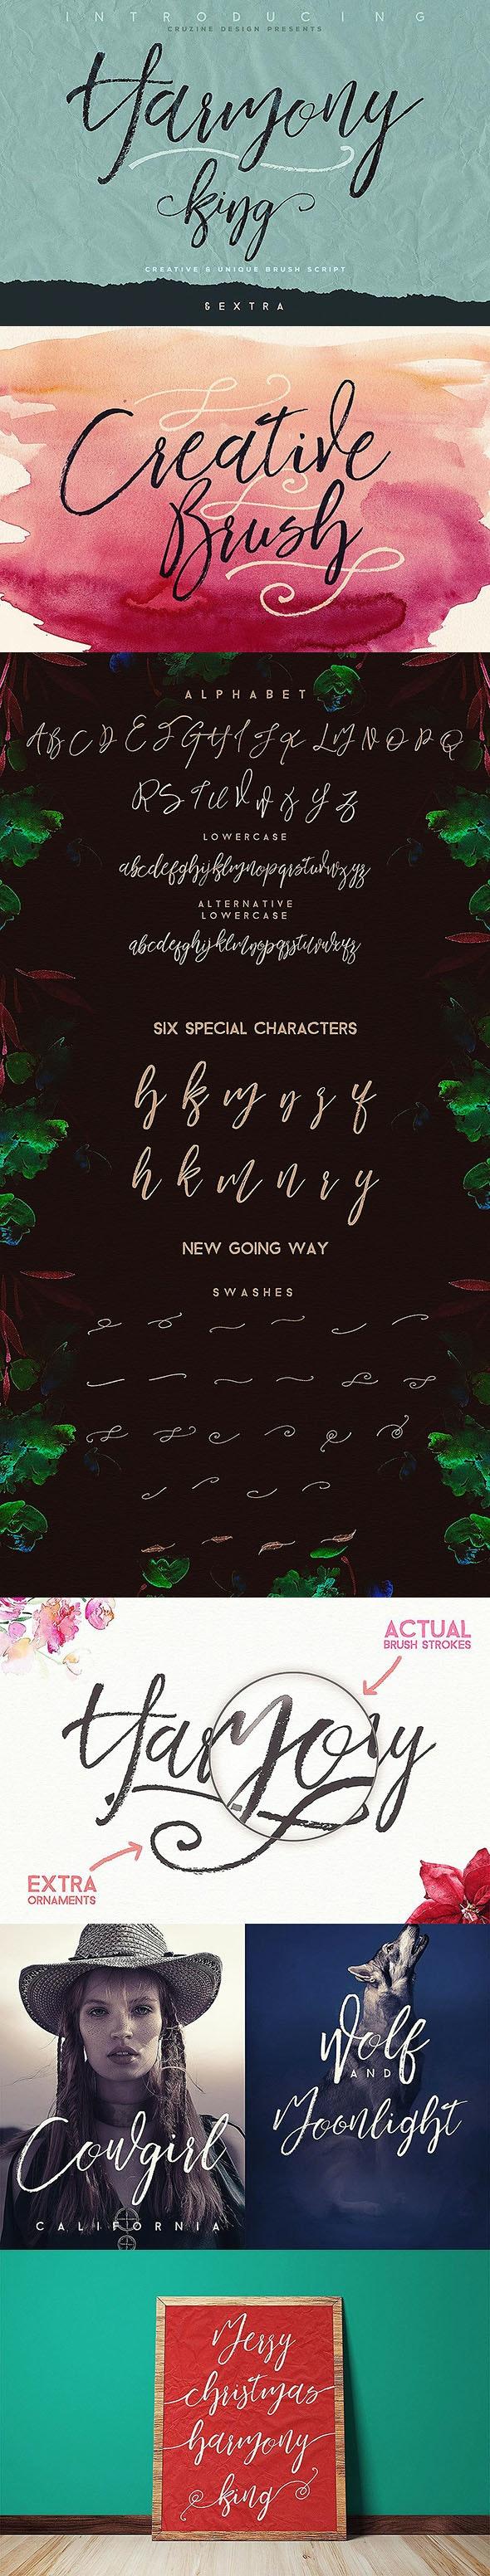 Harmony King - Brush Font - Hand-writing Script